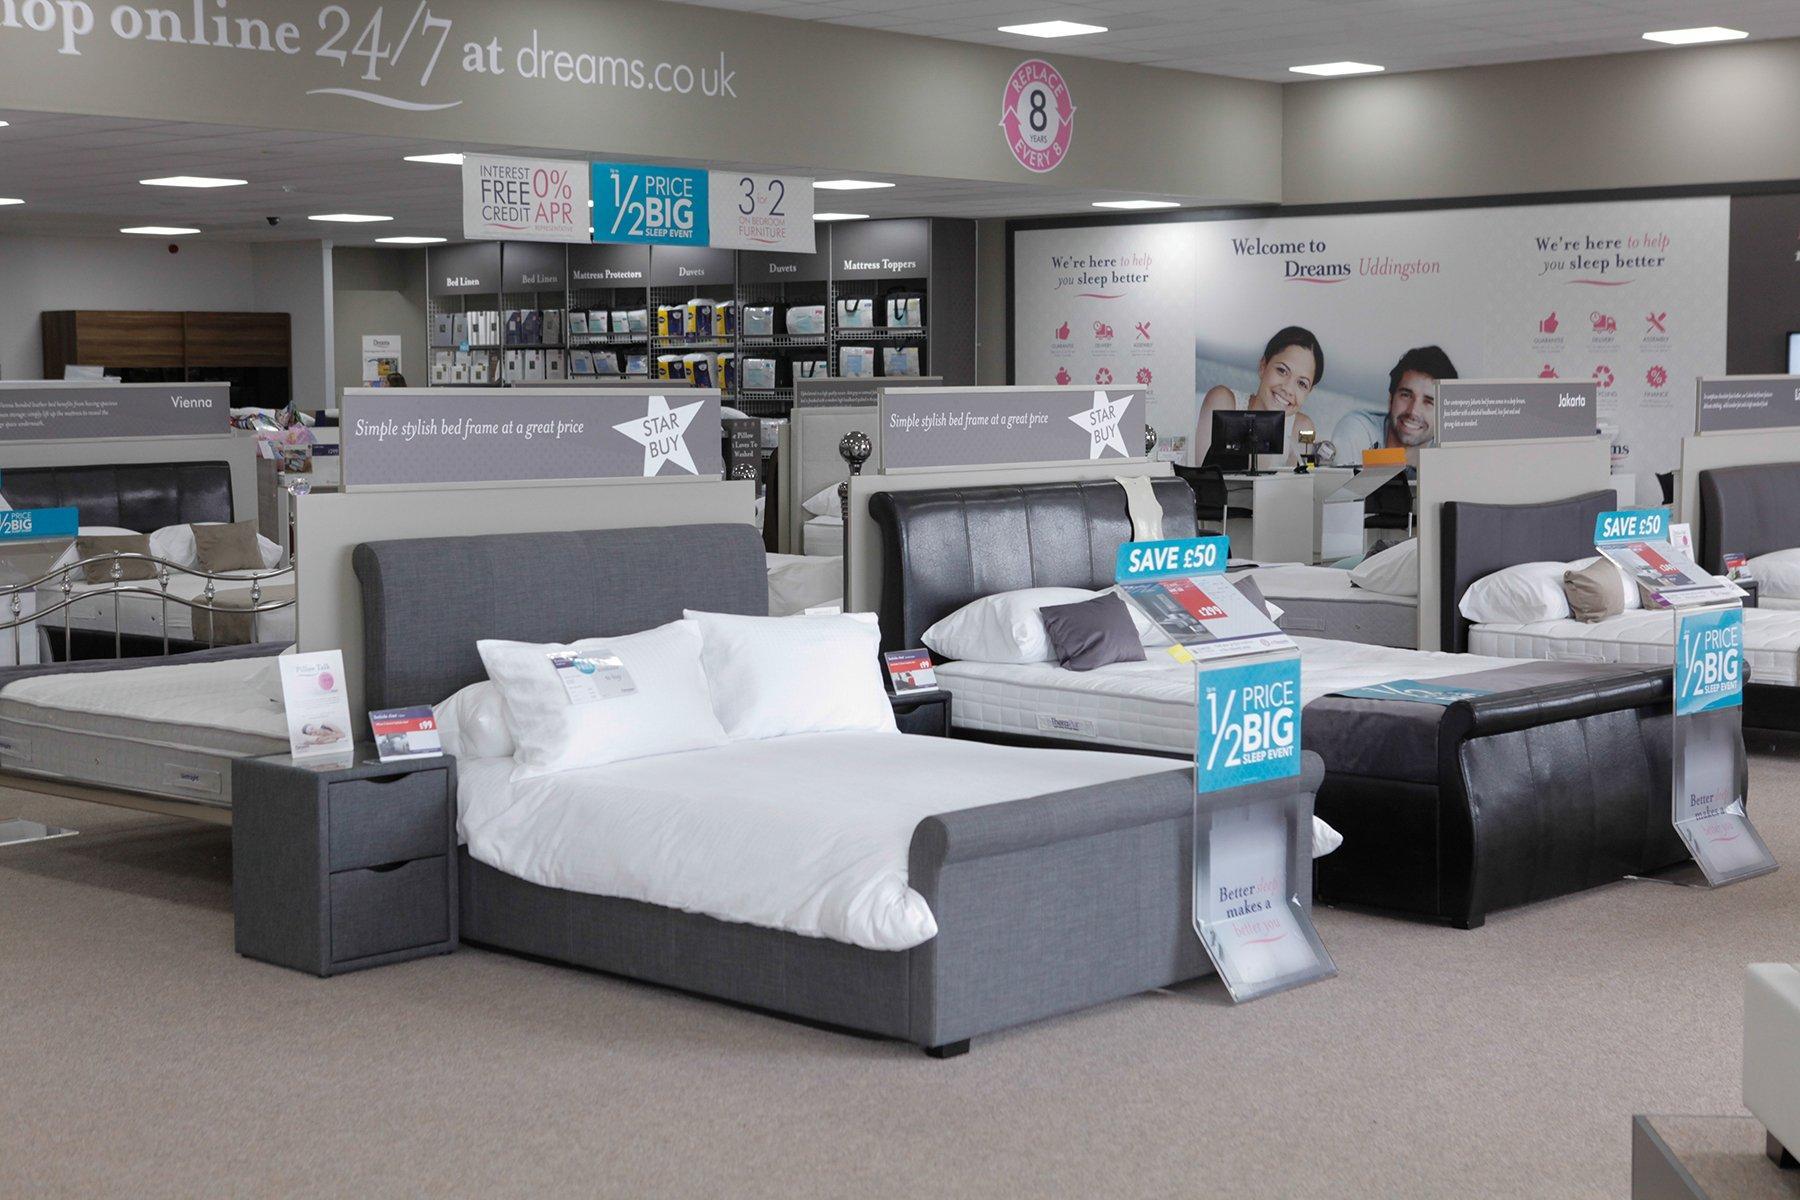 free sofa uplift glasgow bed 3 fold mattress dreams store in uddingston beds mattresses furniture